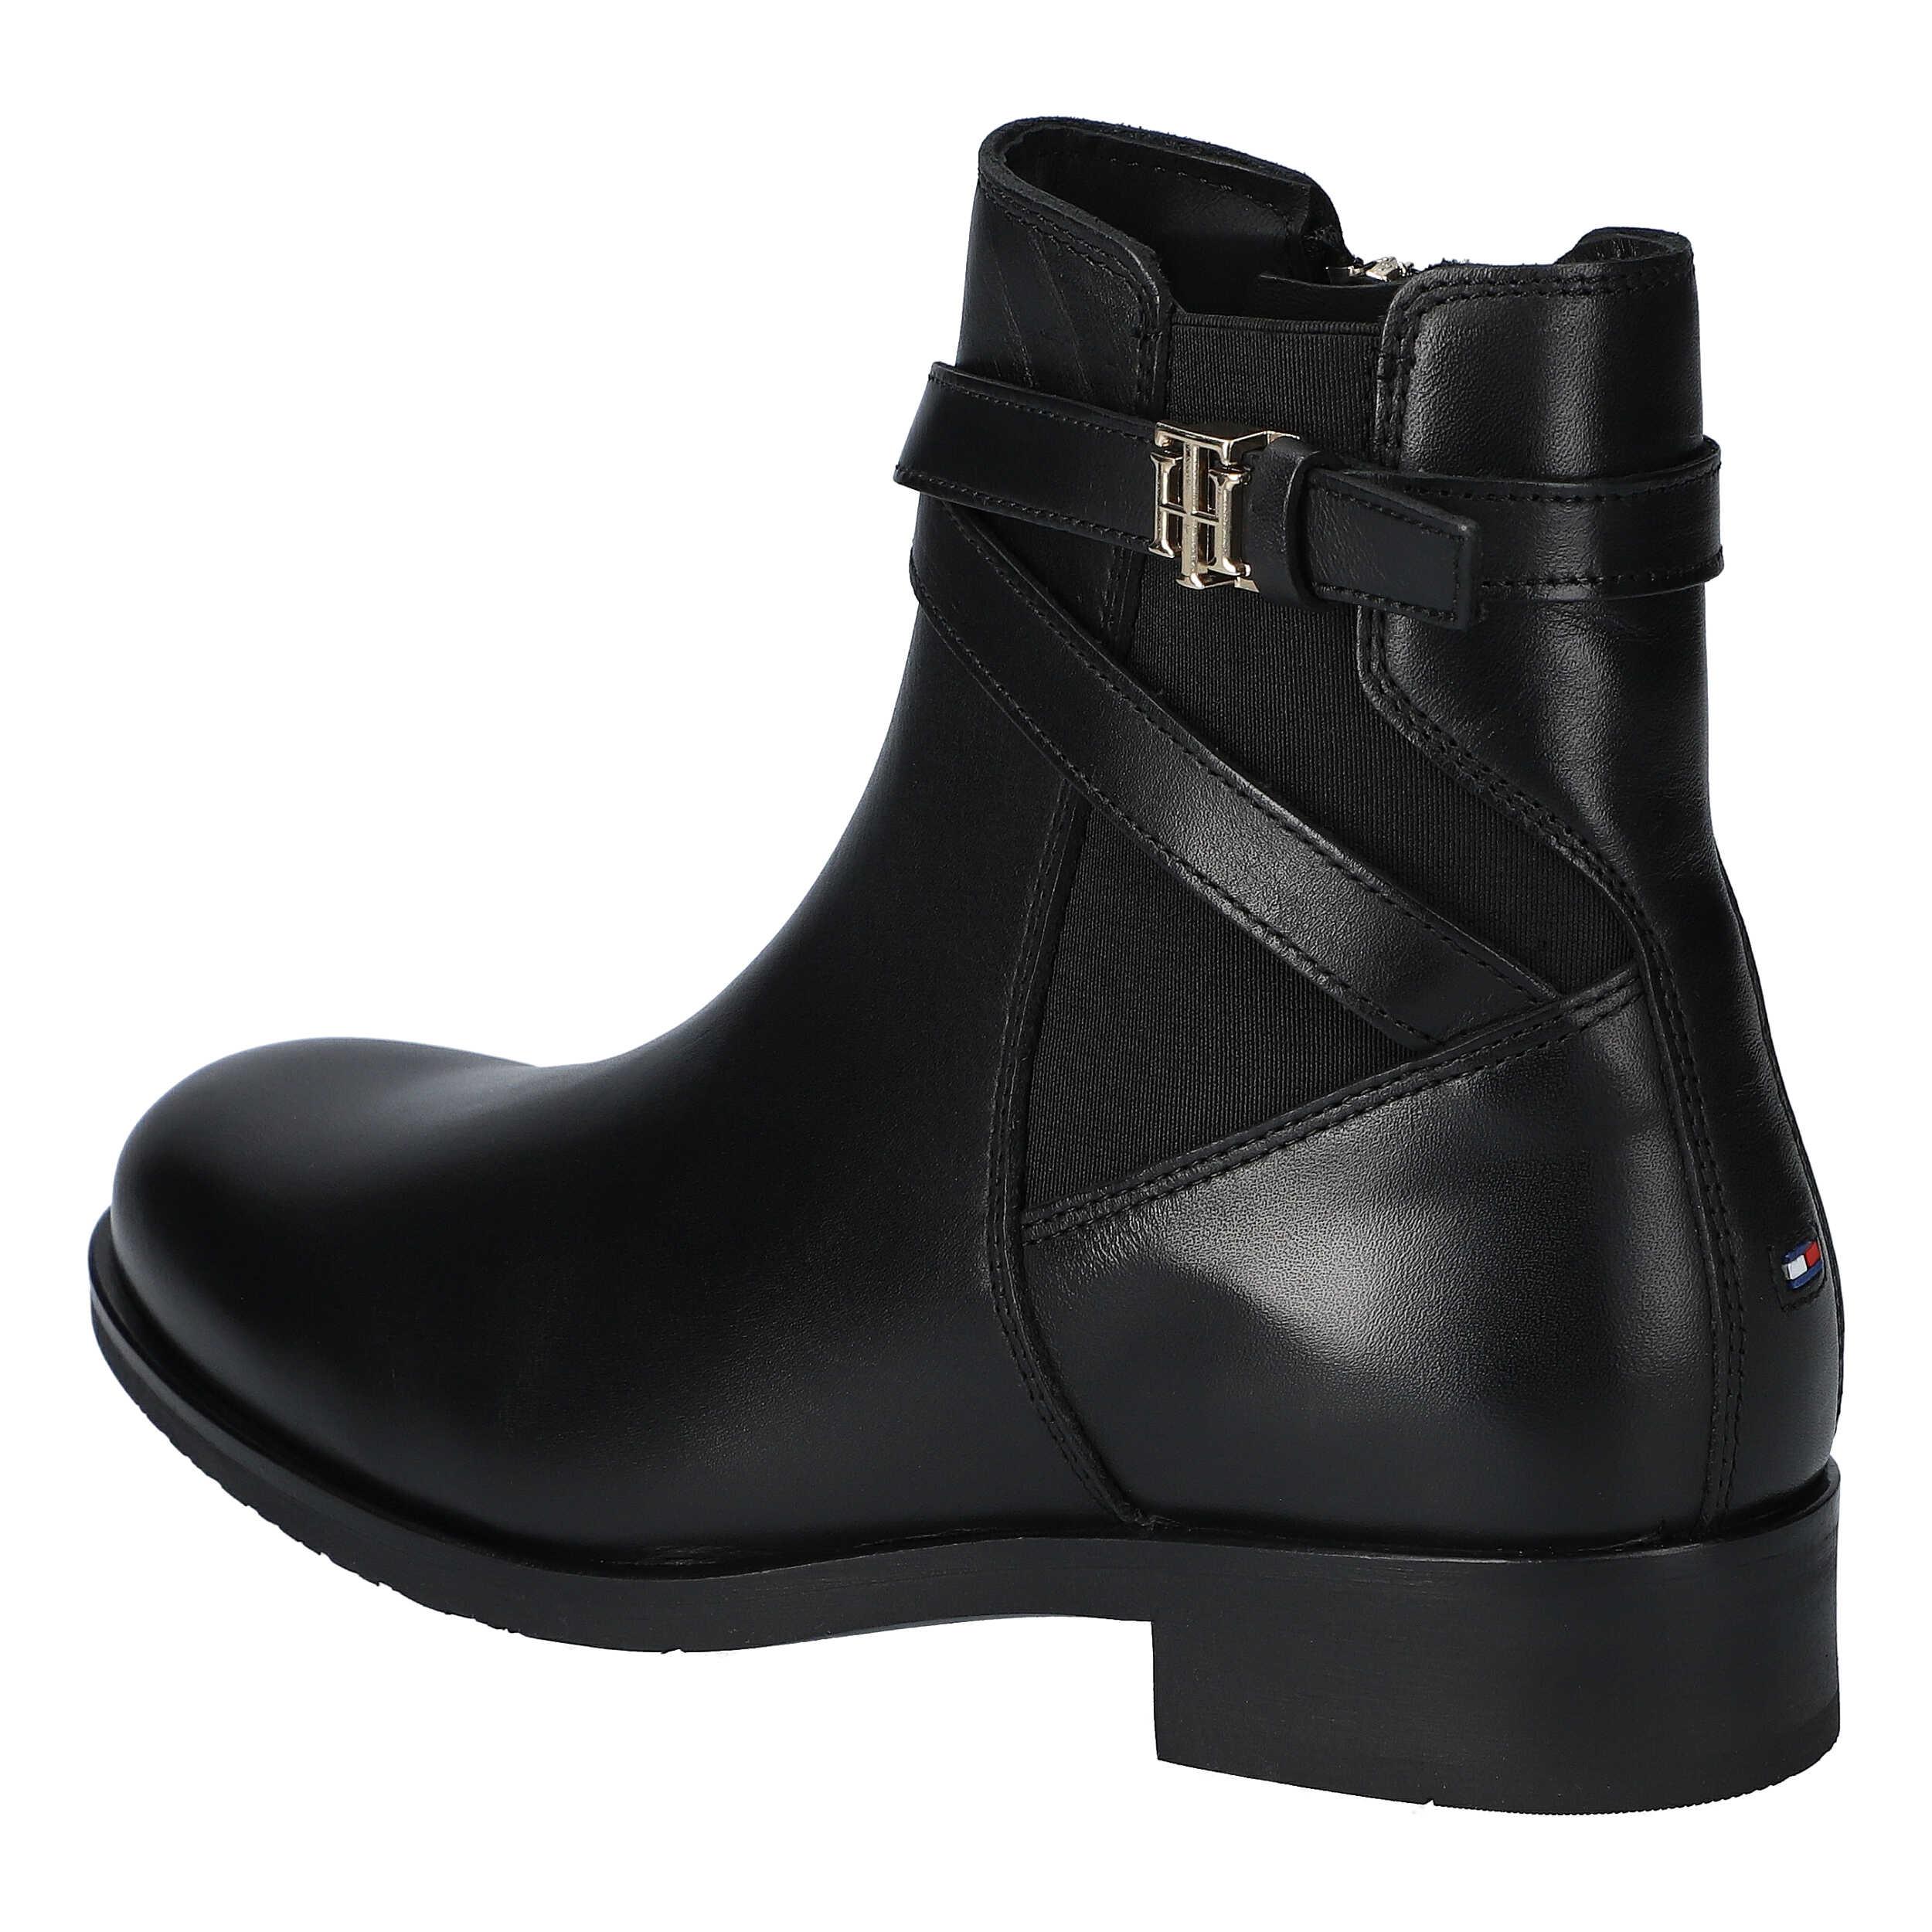 TH Hardware On Belt Flat Boot